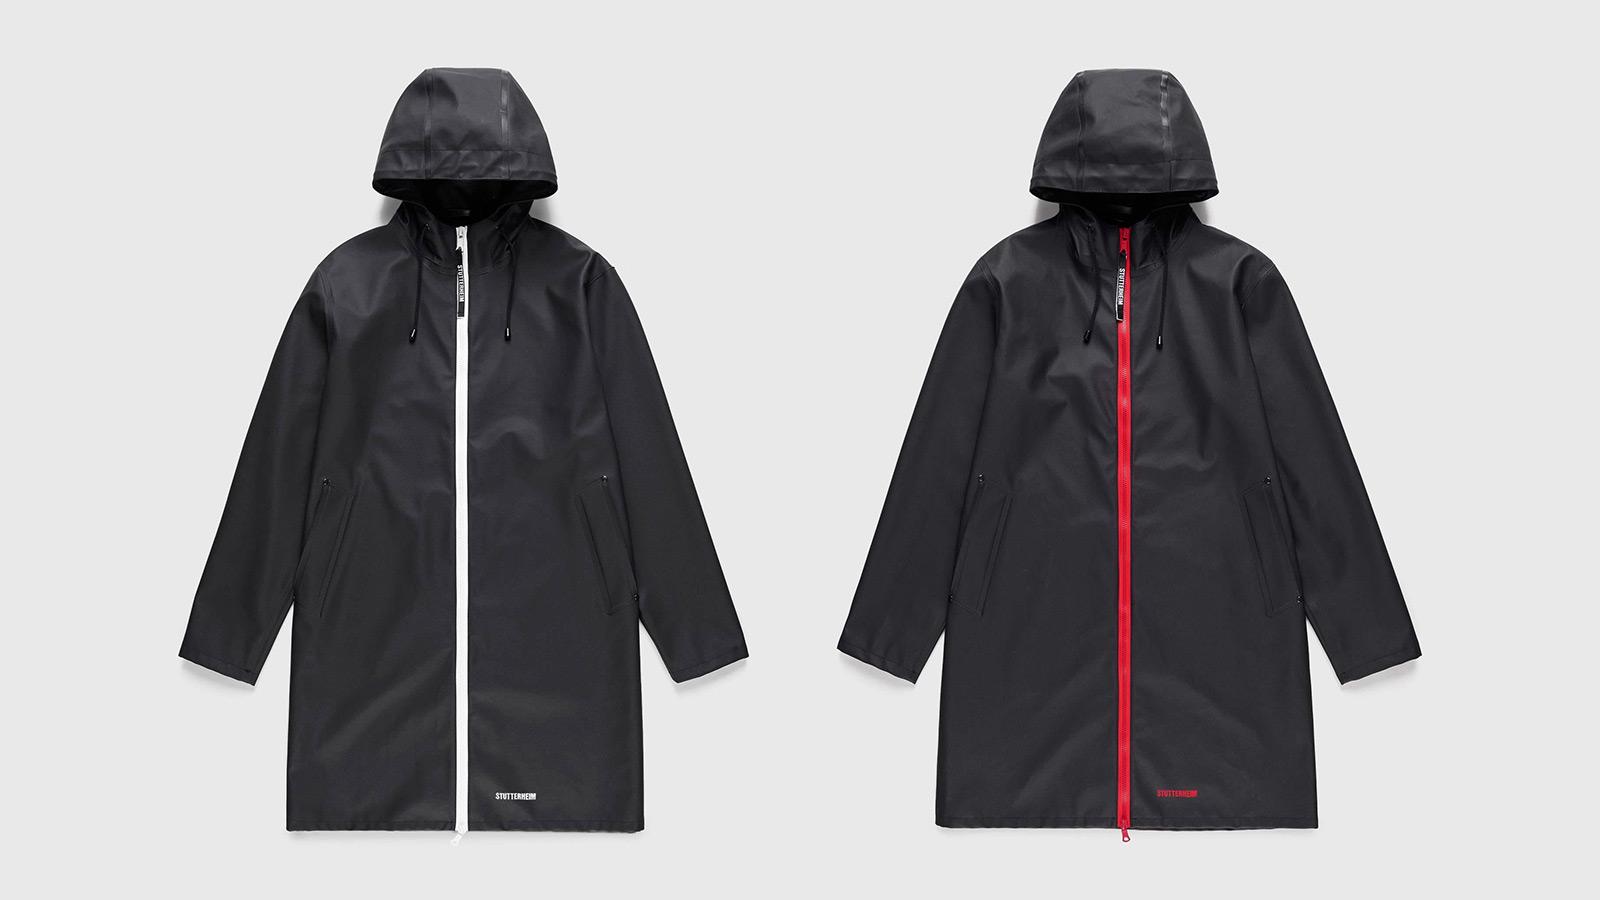 Stutterheim Ostermalm Raincoat